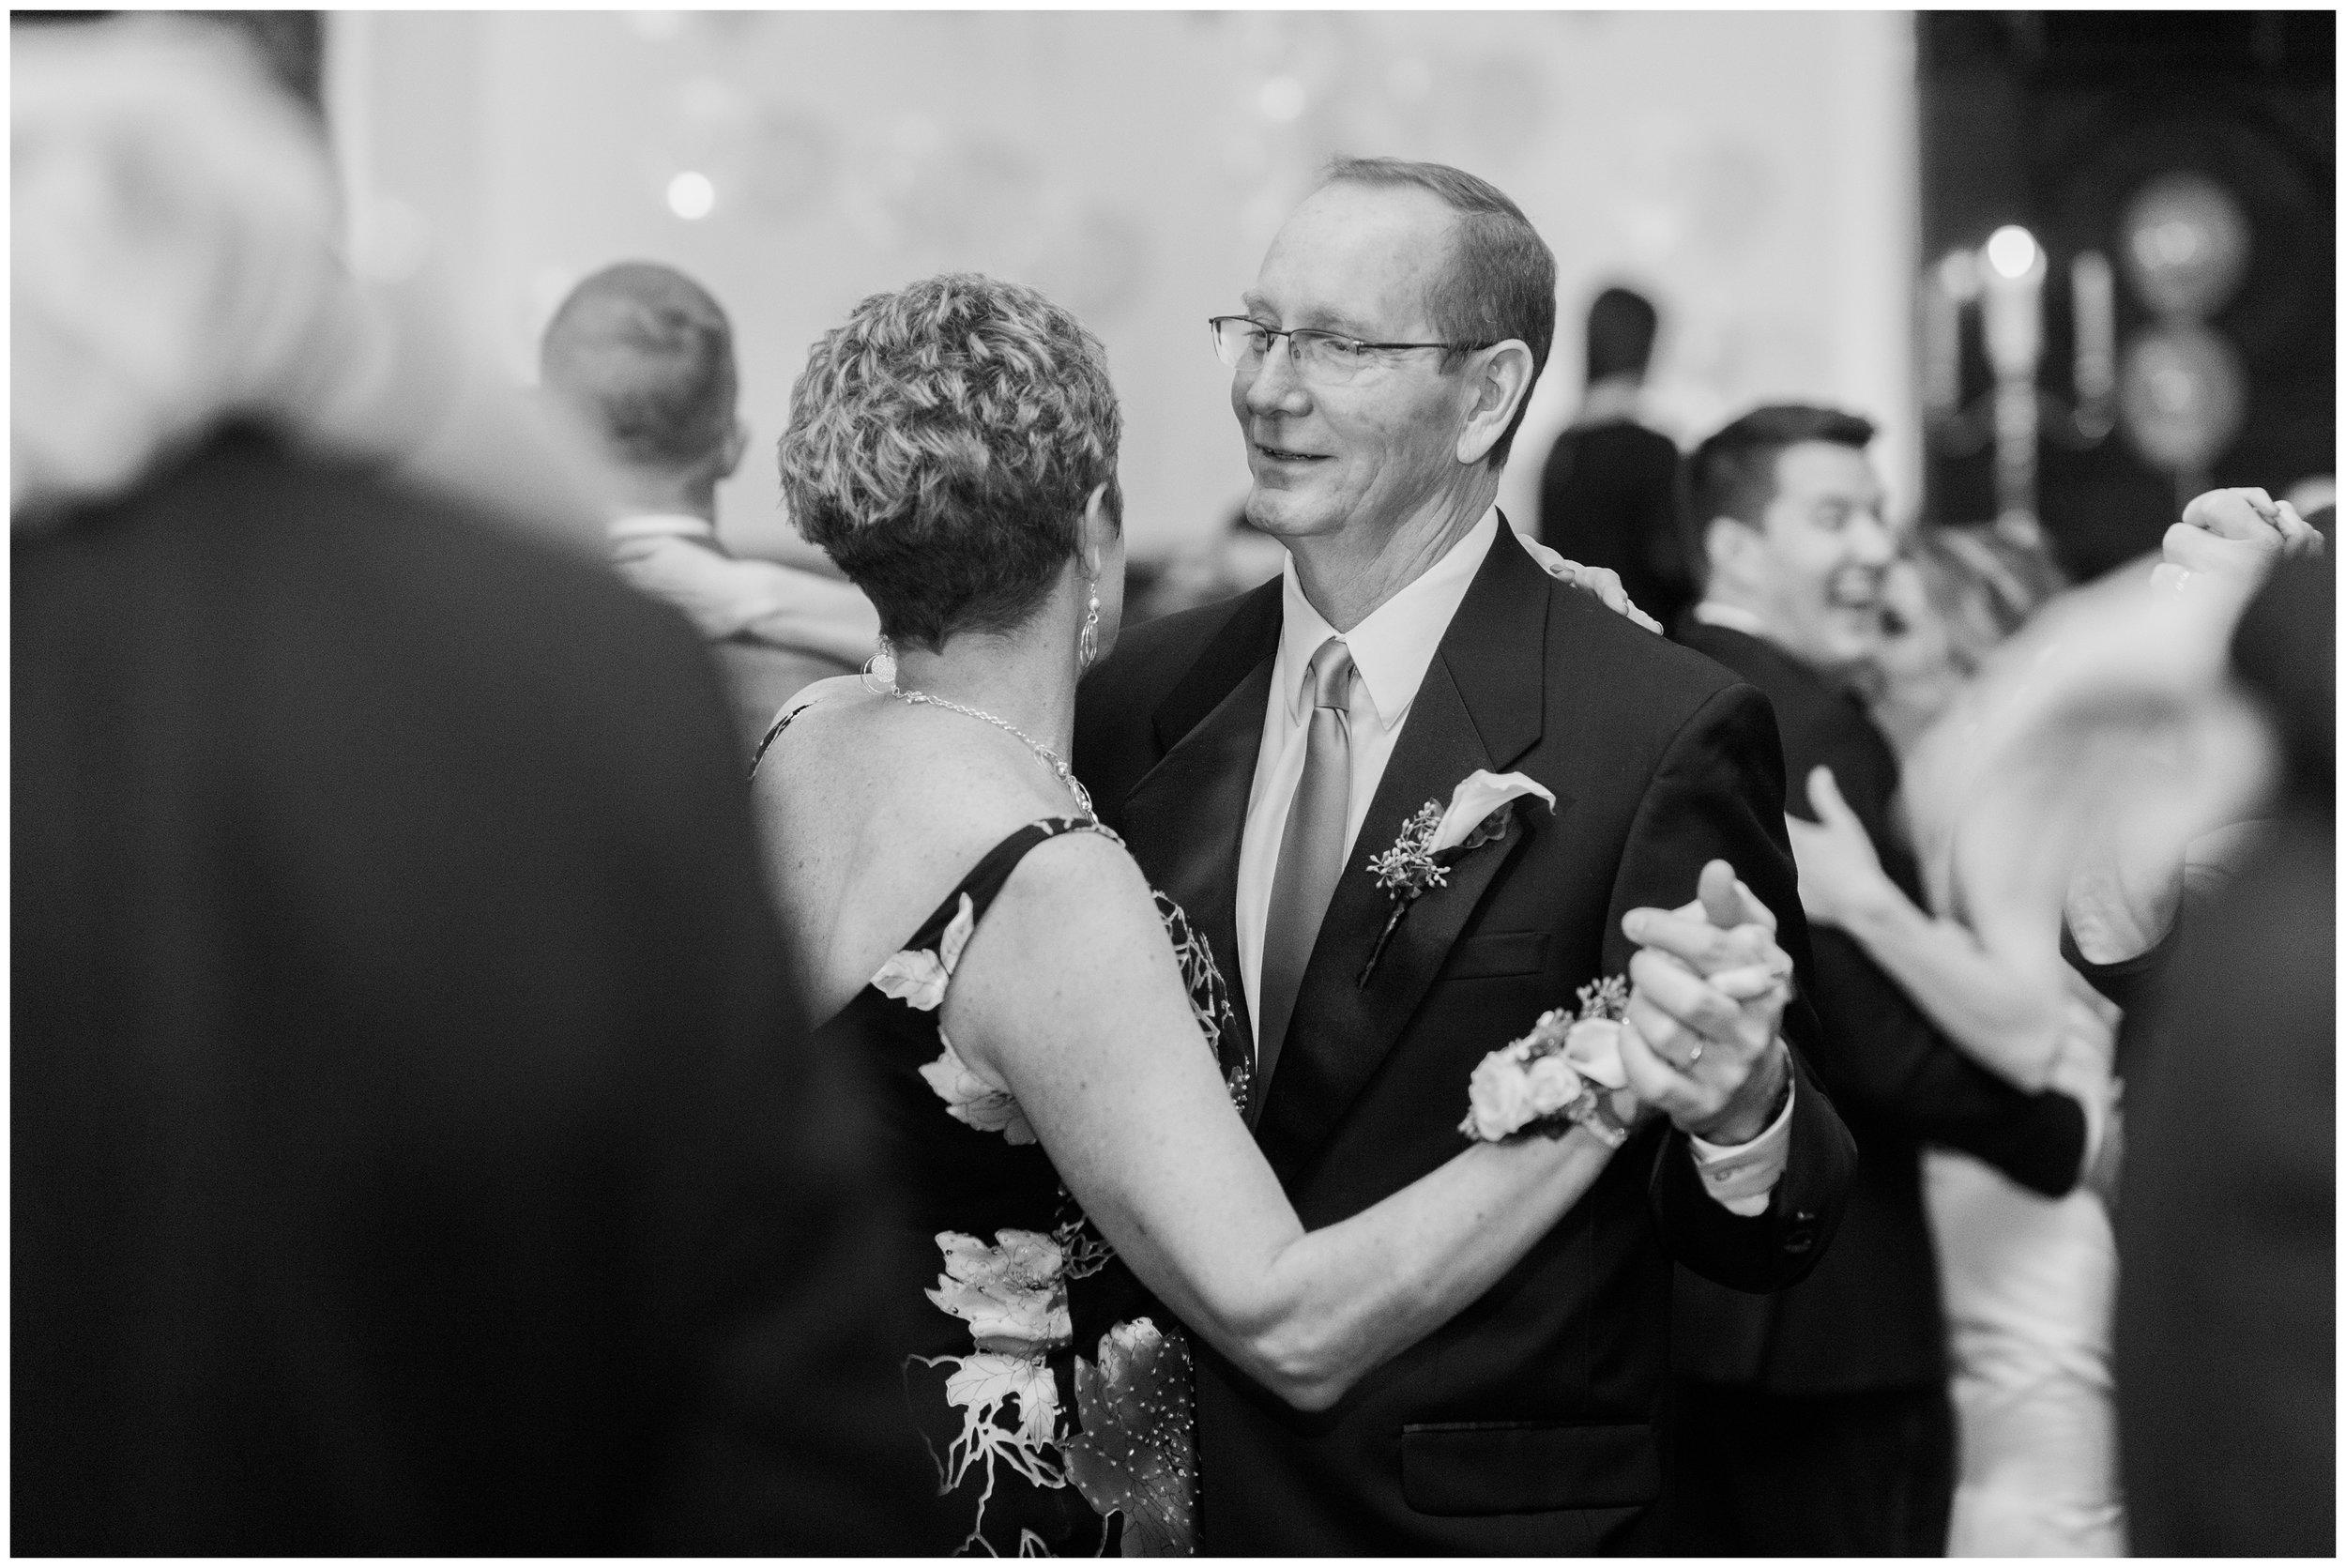 Rebecca_Bridges_Photography_Indianapolis_Wedding_Photographer_5859.jpg